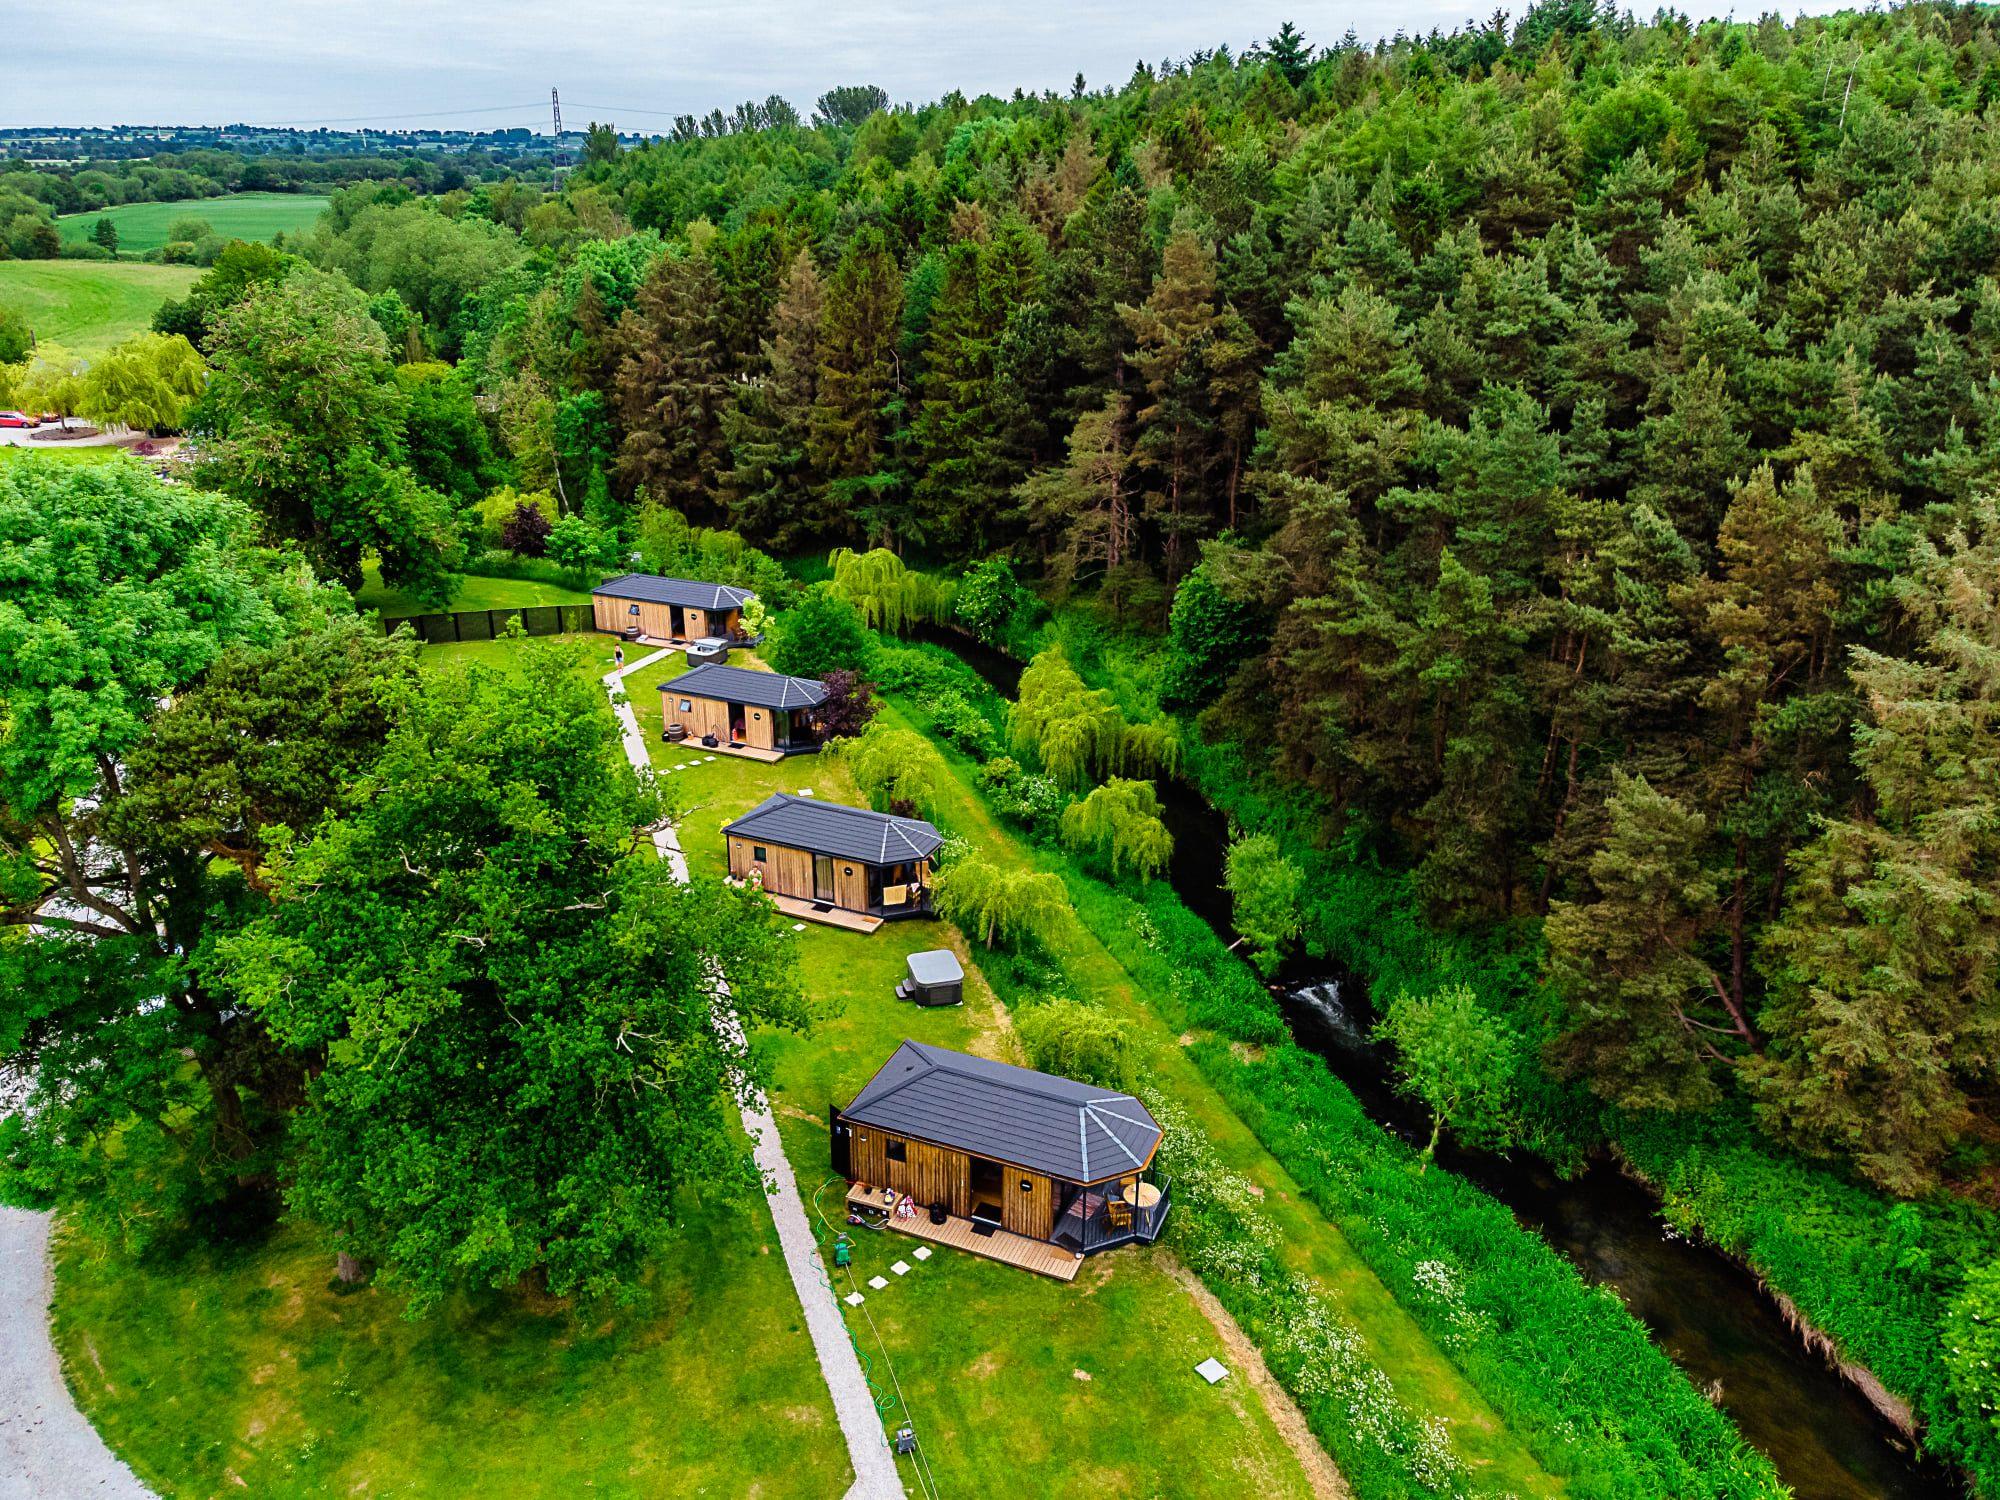 Birds eye view of riverside cabins